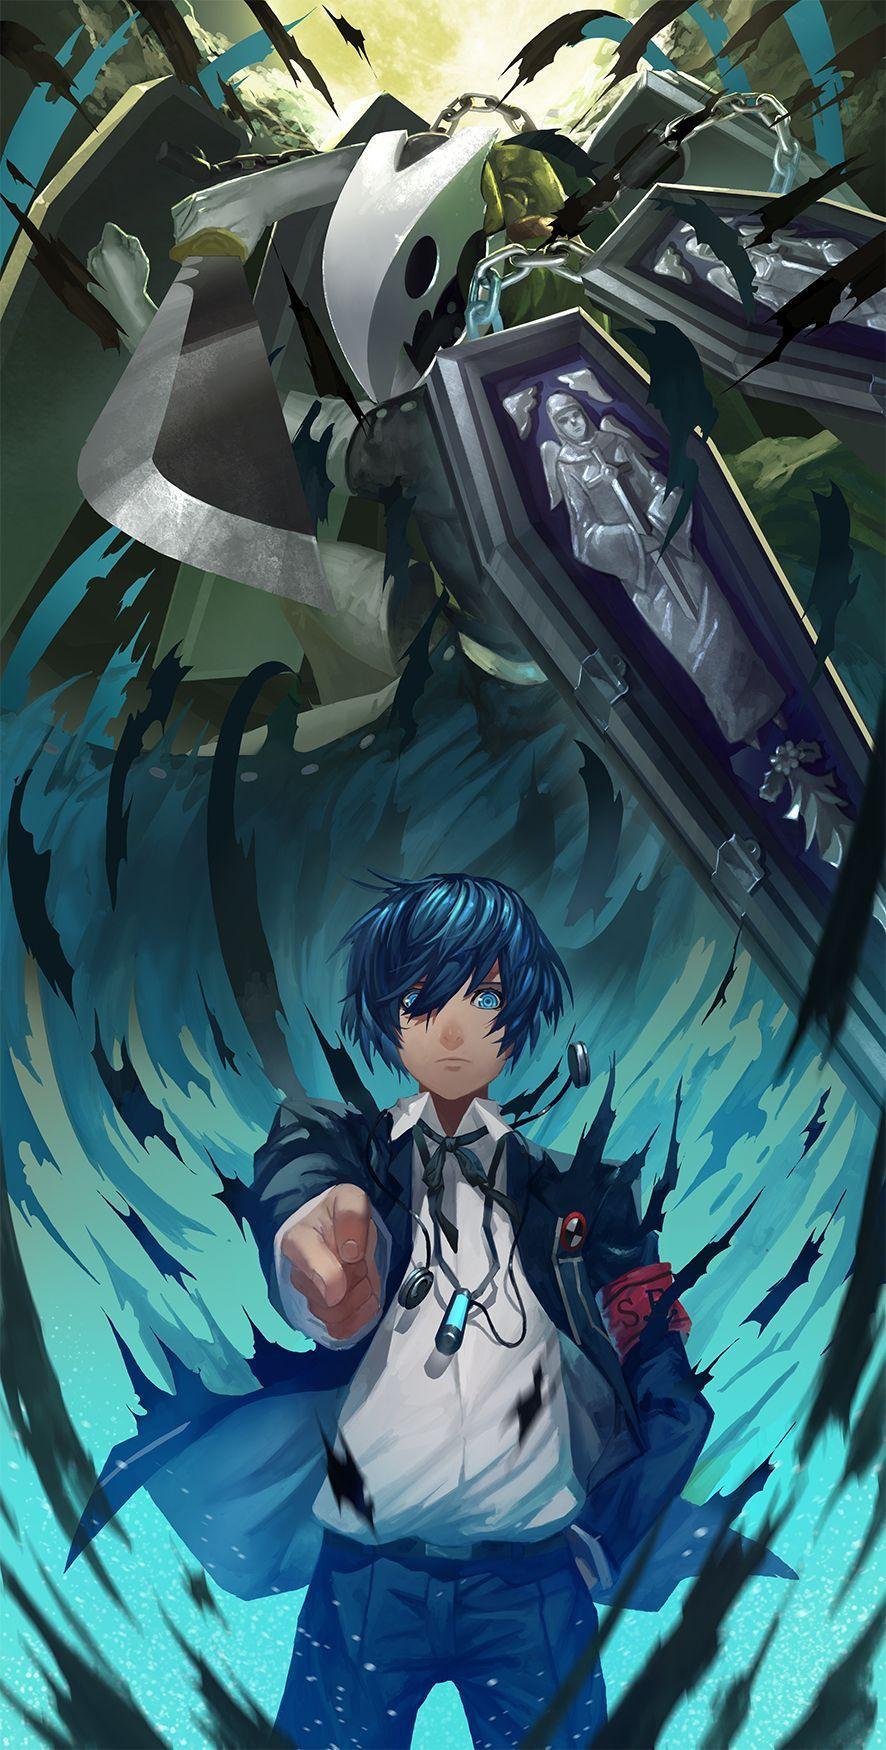 Persona 3 Thanatos Wallpapers - Wallpaper Cave